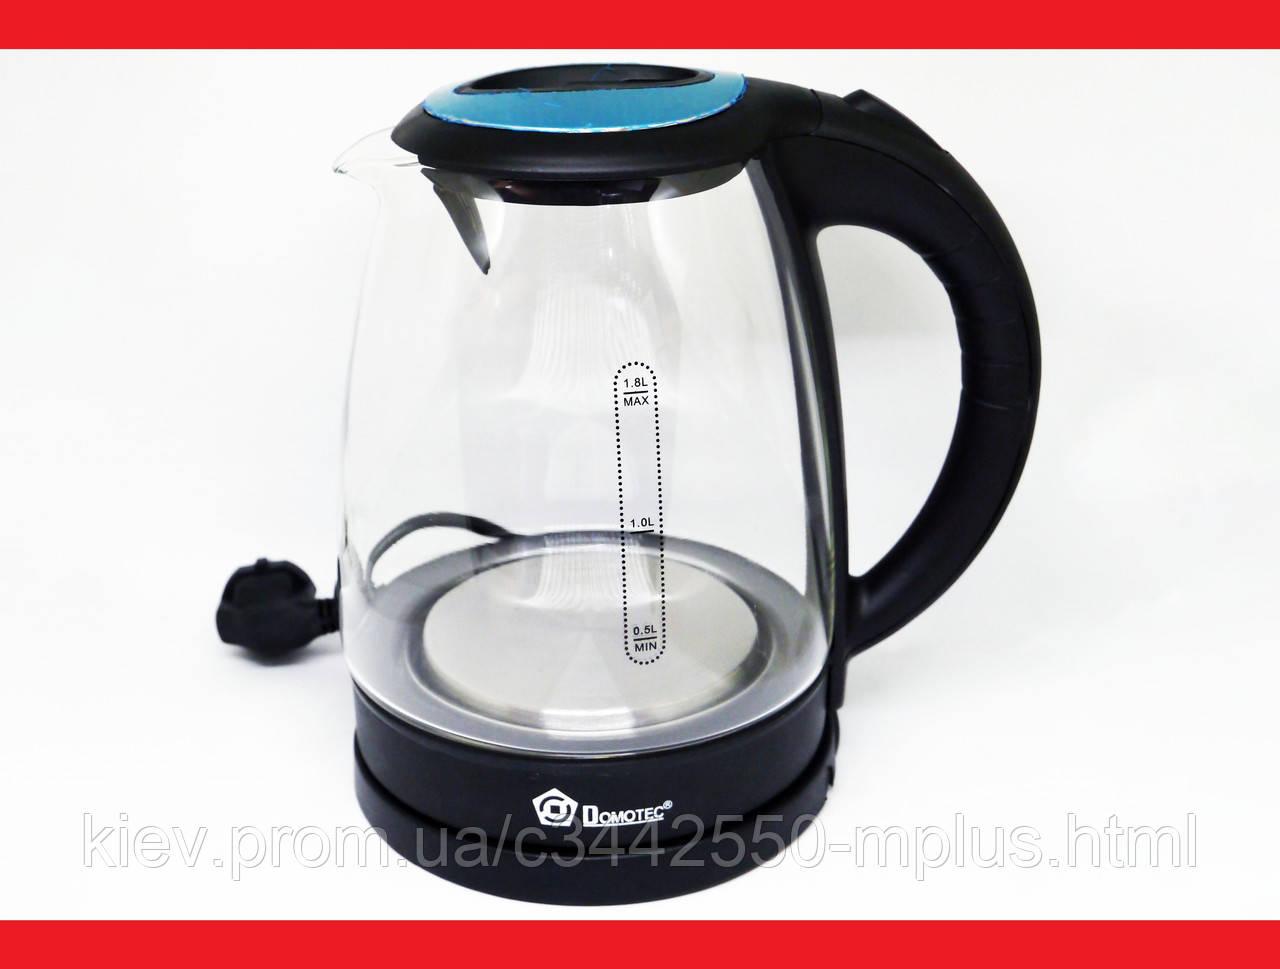 Domotec MS-8110 2200W 1.8L Чайник электрический (стеклянная колба)  LED подсветка